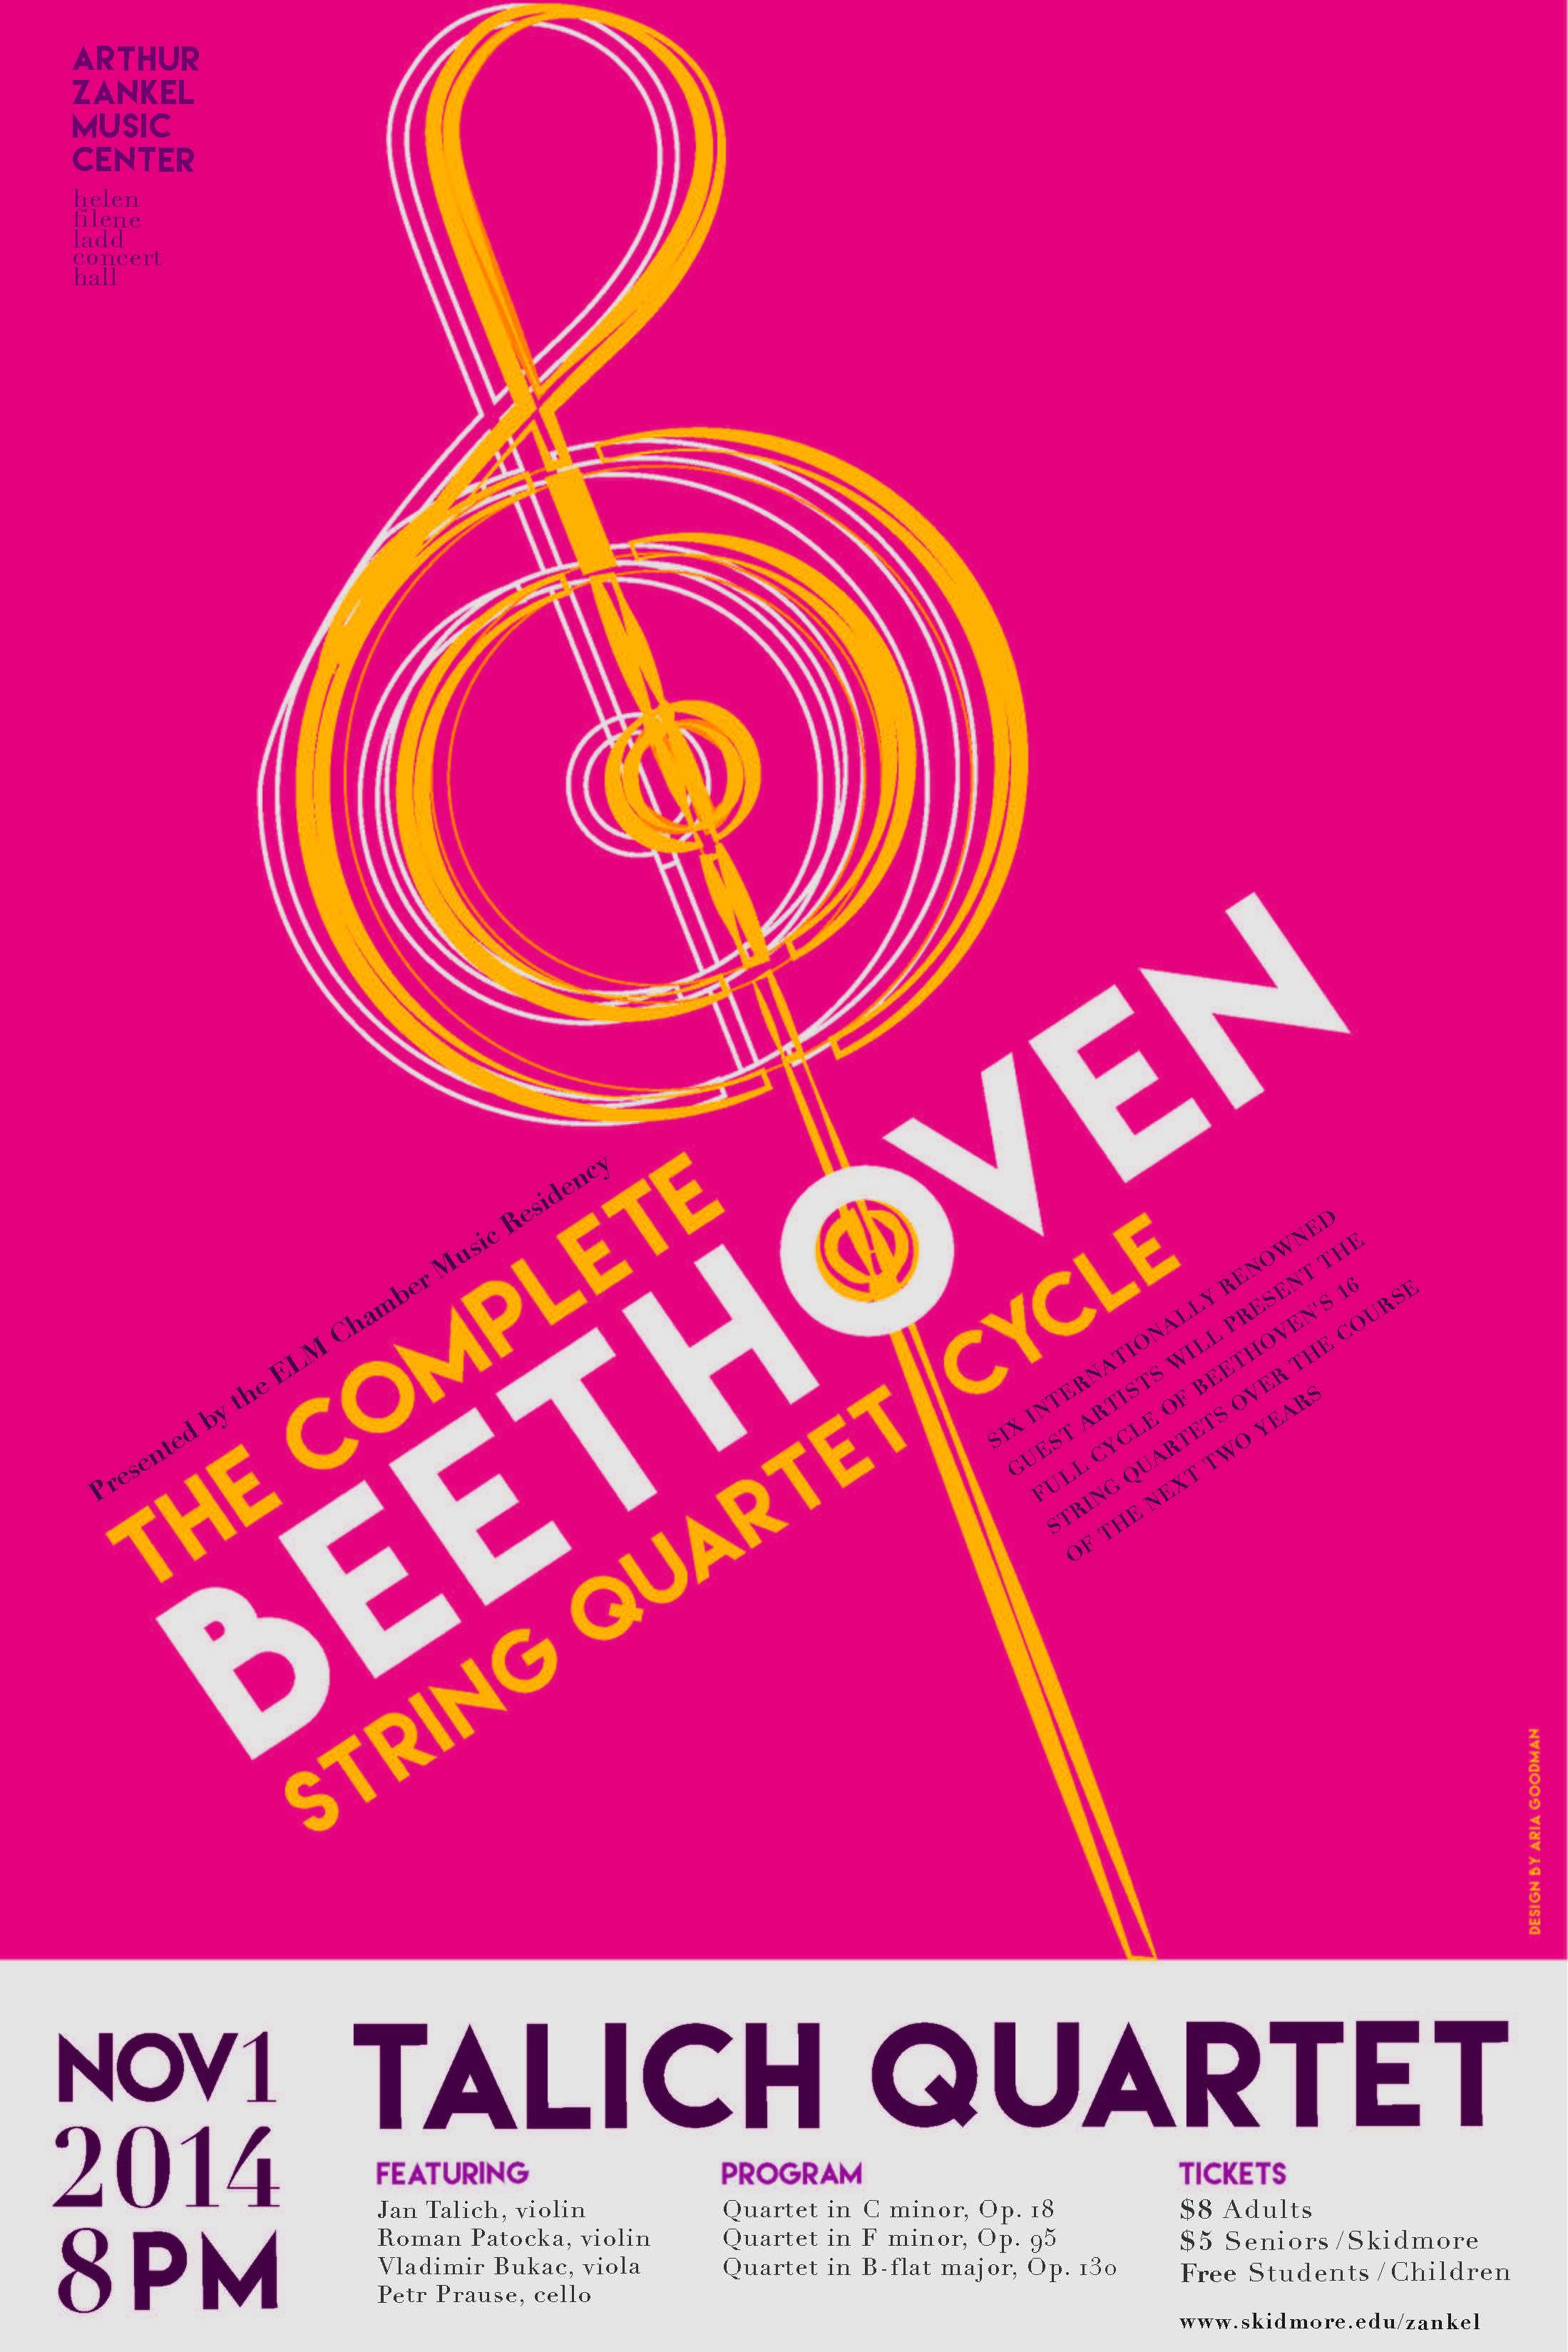 11/1/14 Talich Quartet on Livestream